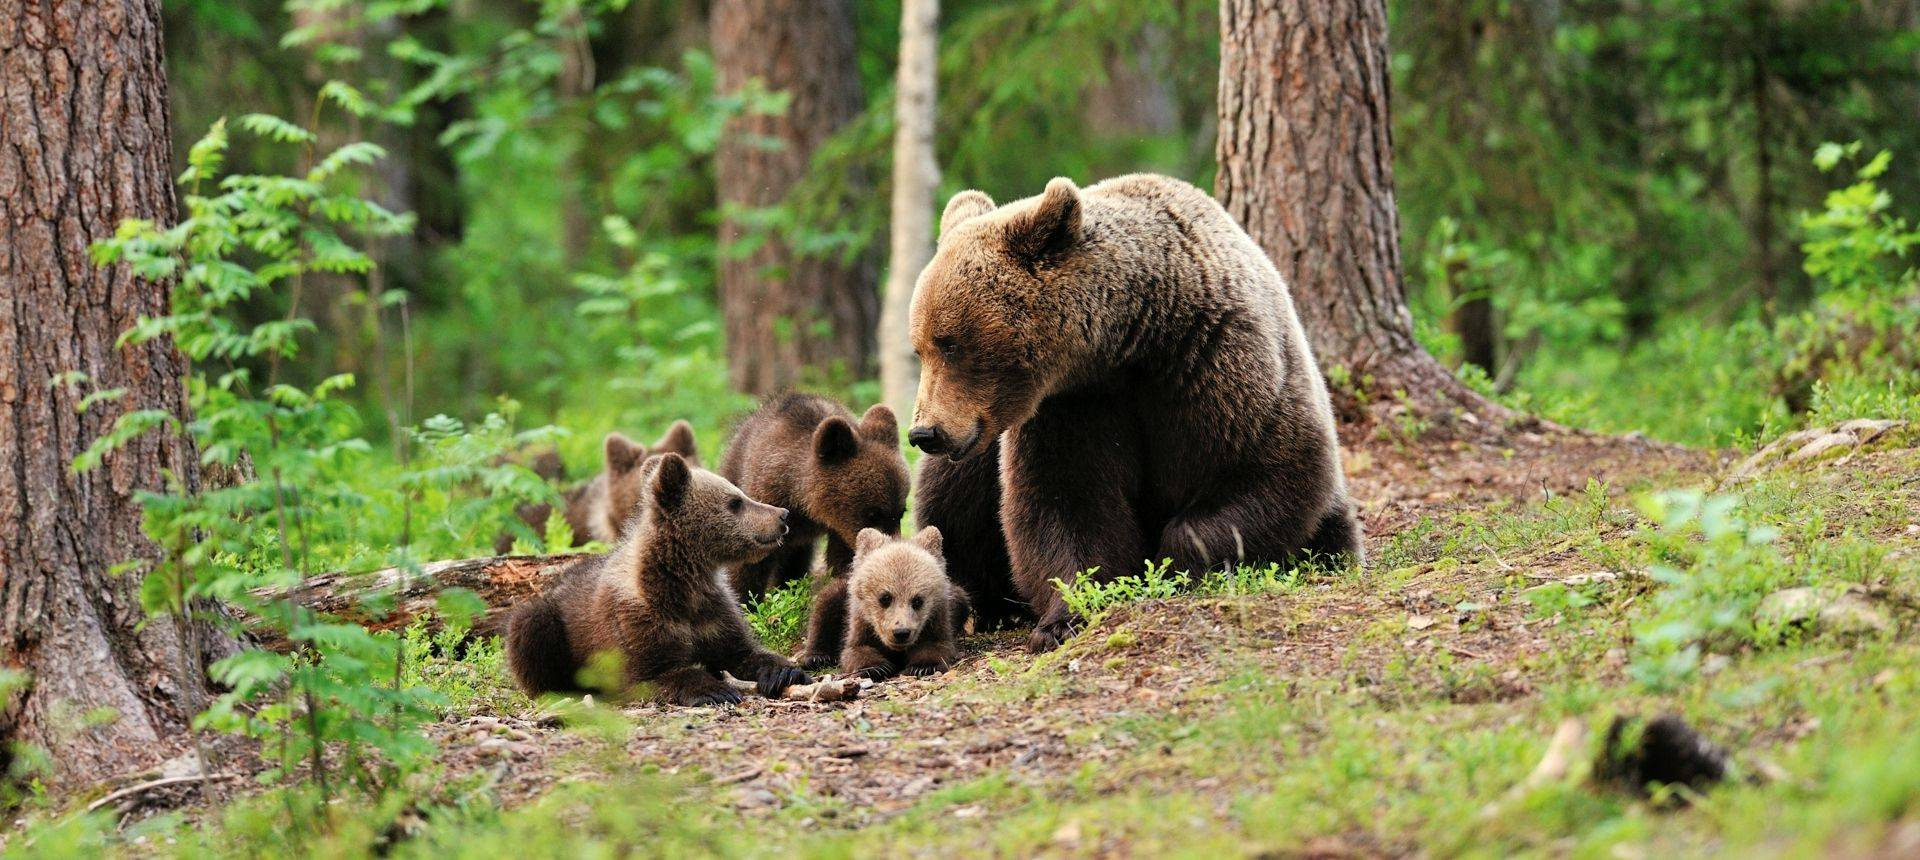 Brown Bears Finland Shutterstock 198189008